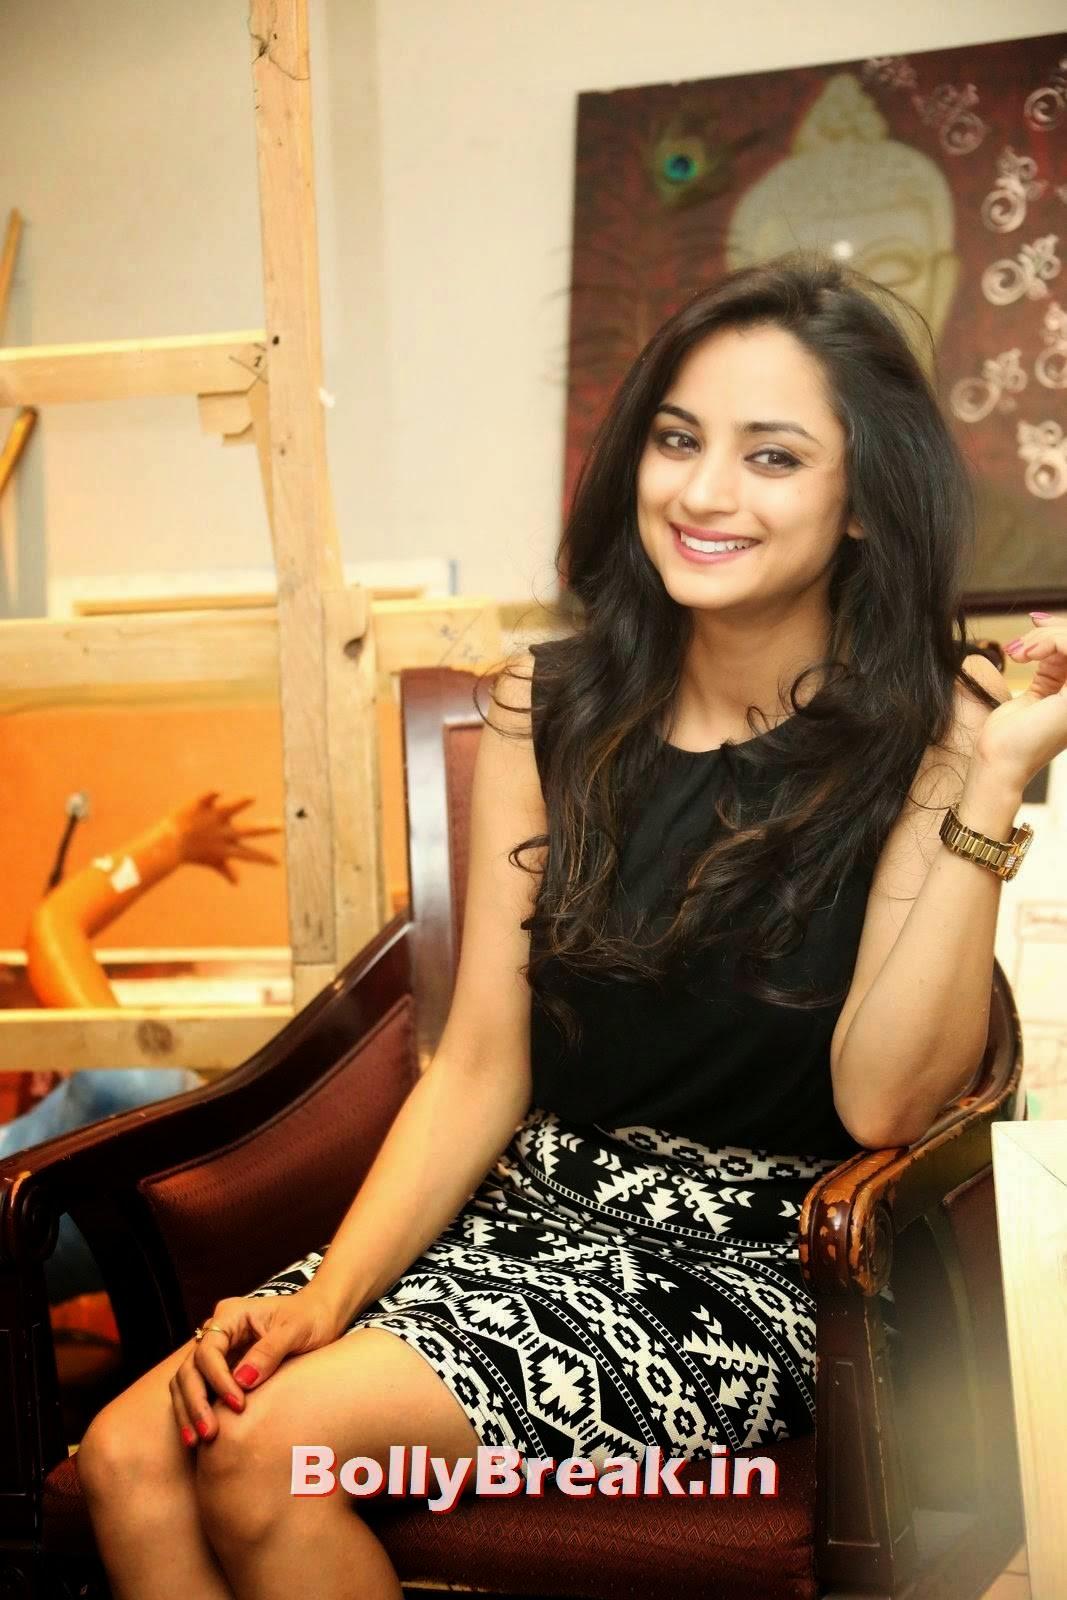 Madirakshi Latest Stills, Actress Madirakshi Hot Pics in Skirt & Black Top